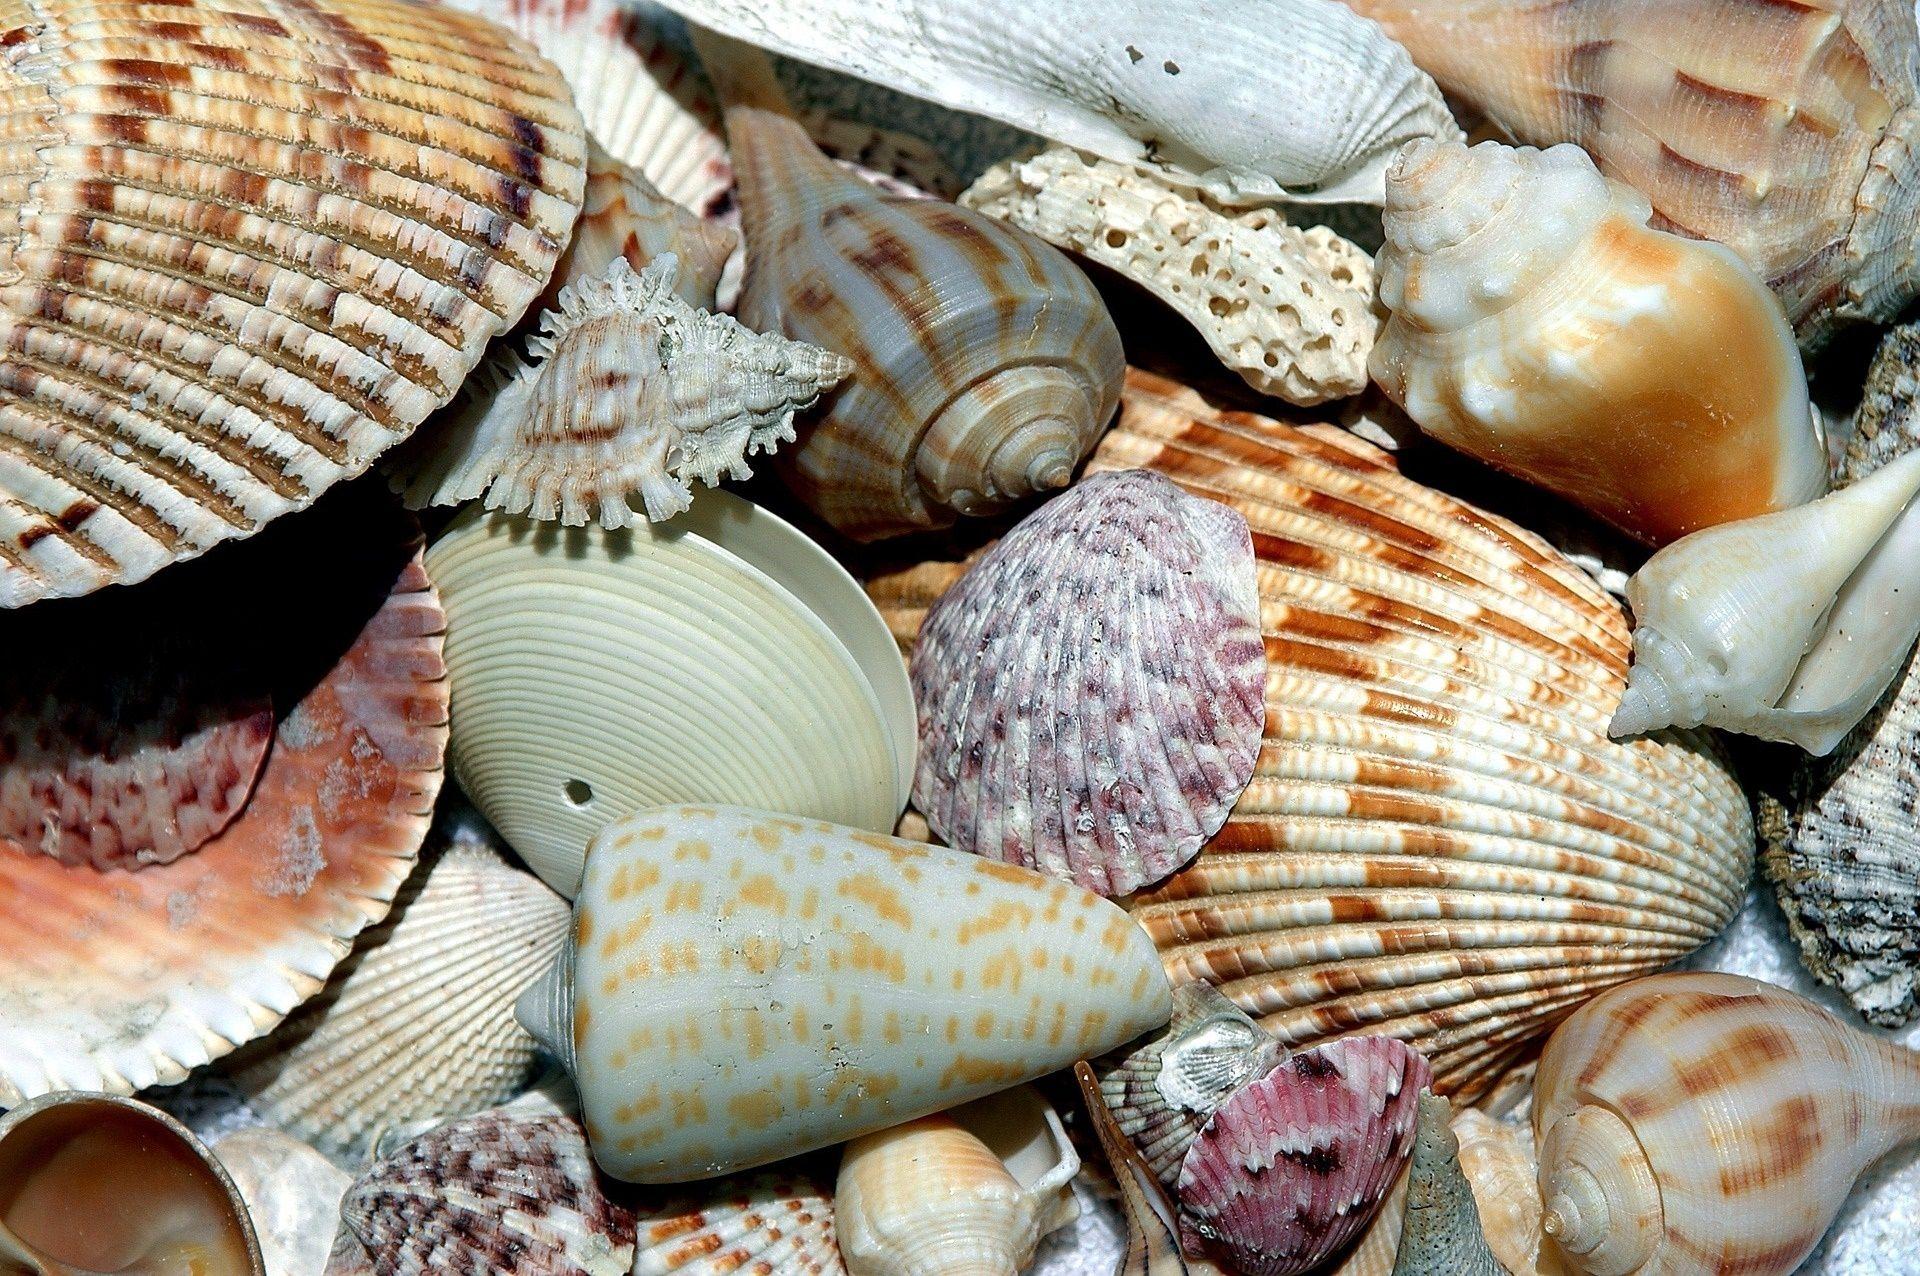 Sanibel Island Shelling Guide Where To Go Rules And Tips Seashells Photography Sea Shells Seashells Pictures